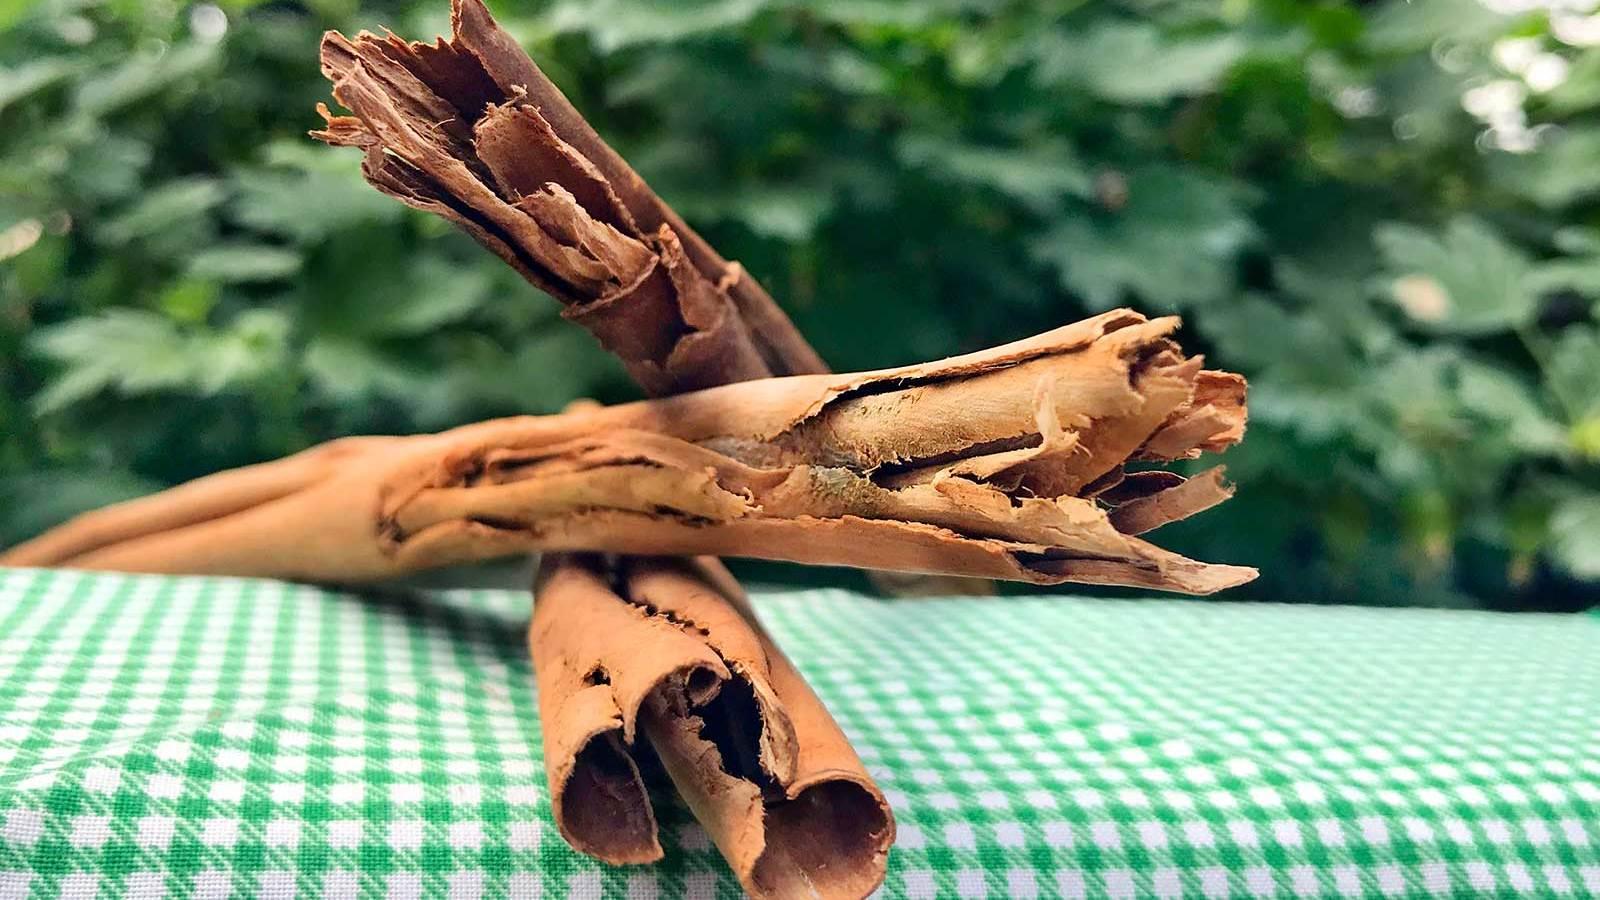 Sri Lanka | Ceylon cinnamon